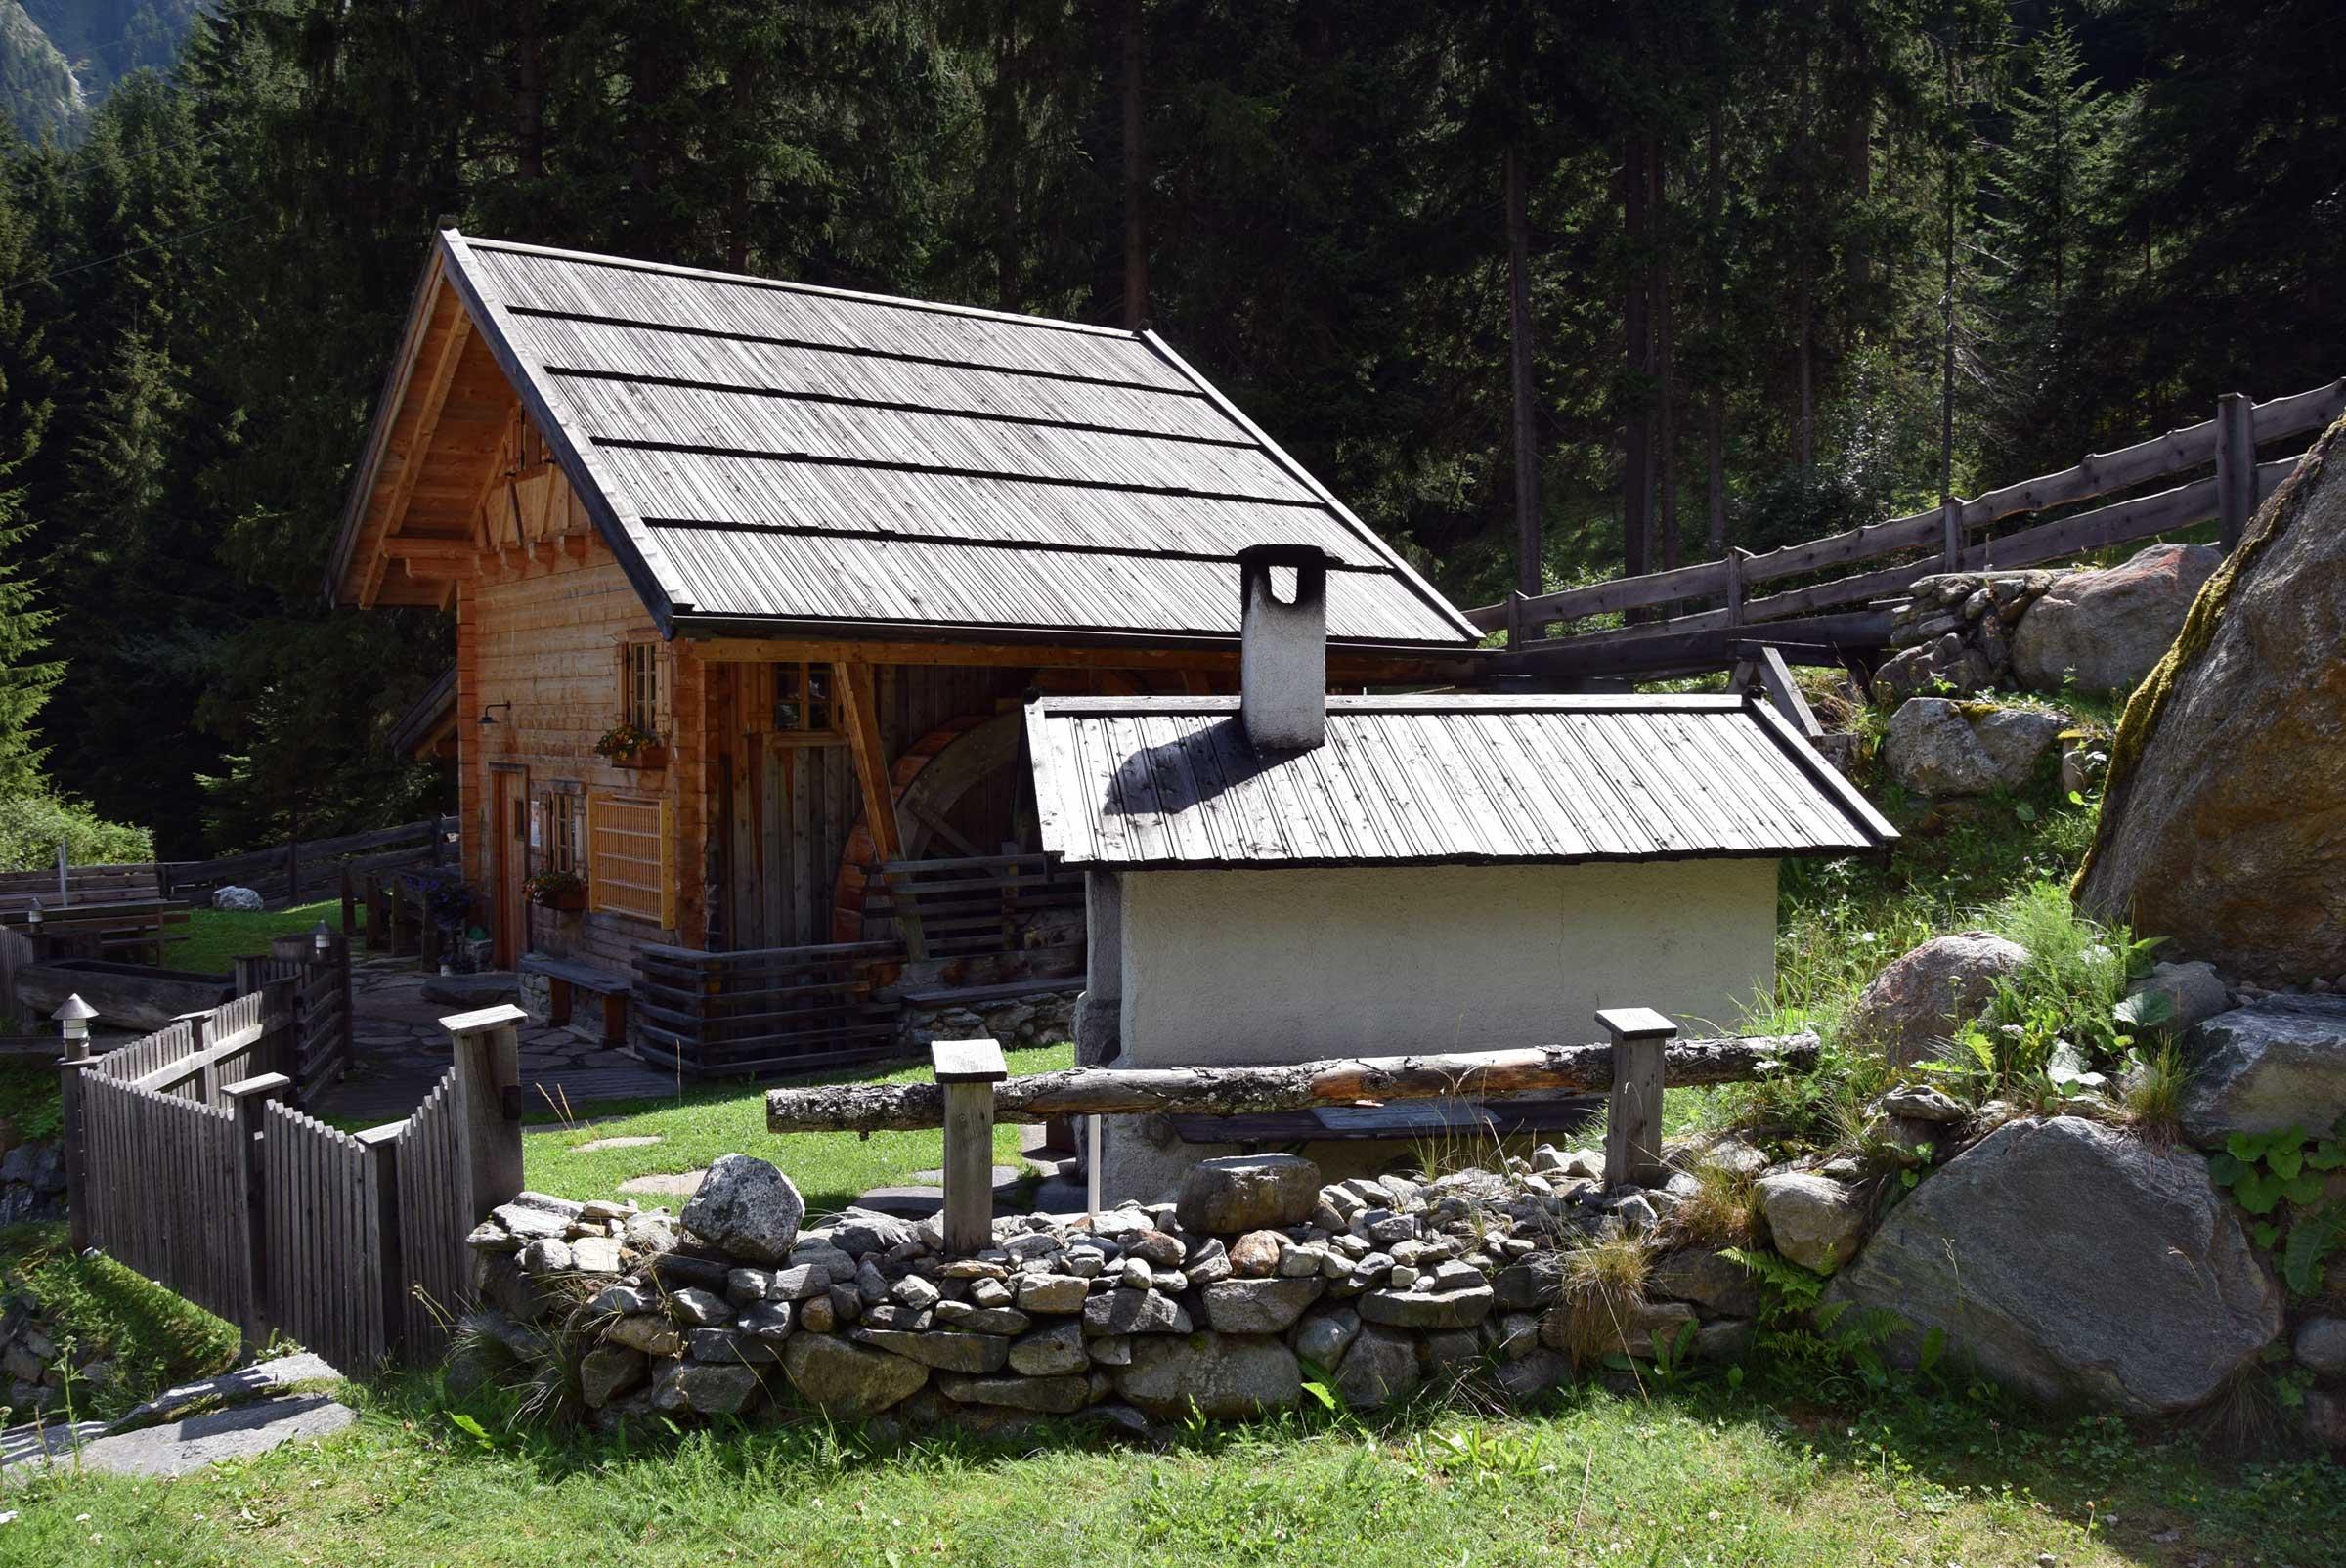 Getreidemühle am Campingplatz Huben - Brot selbst backen im Ötztal